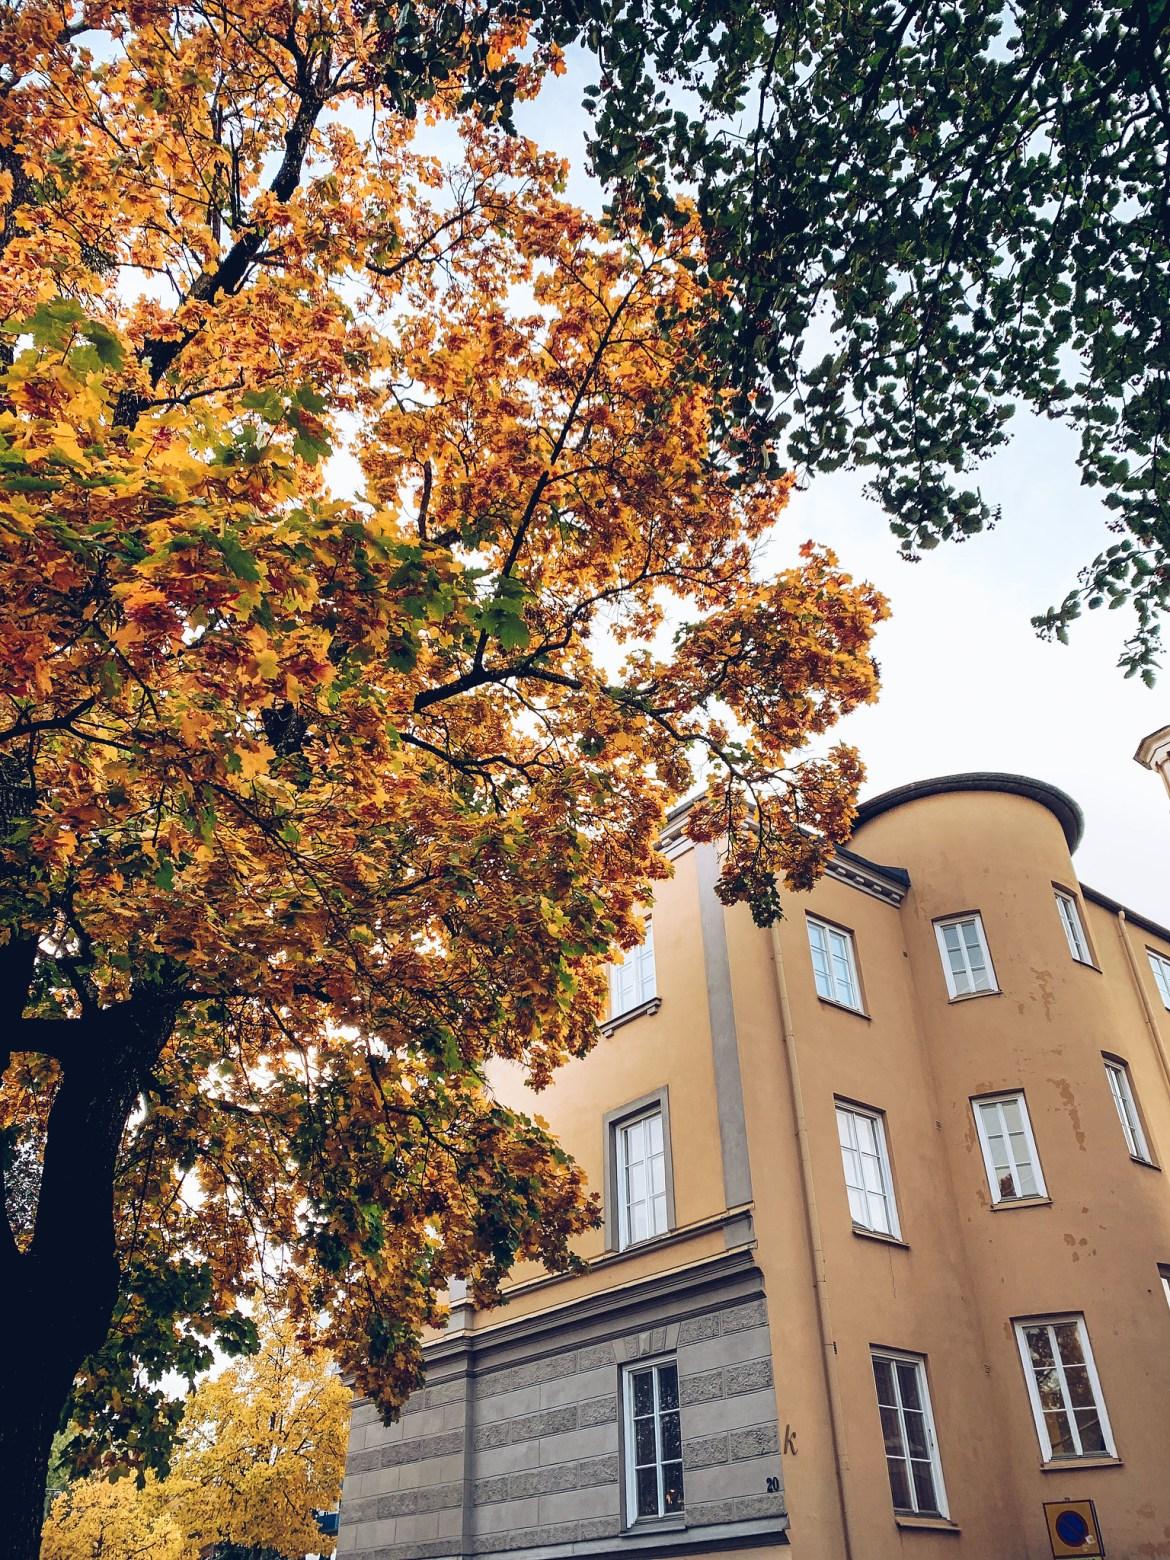 Höst i Eskilstuna - reaktionista.se